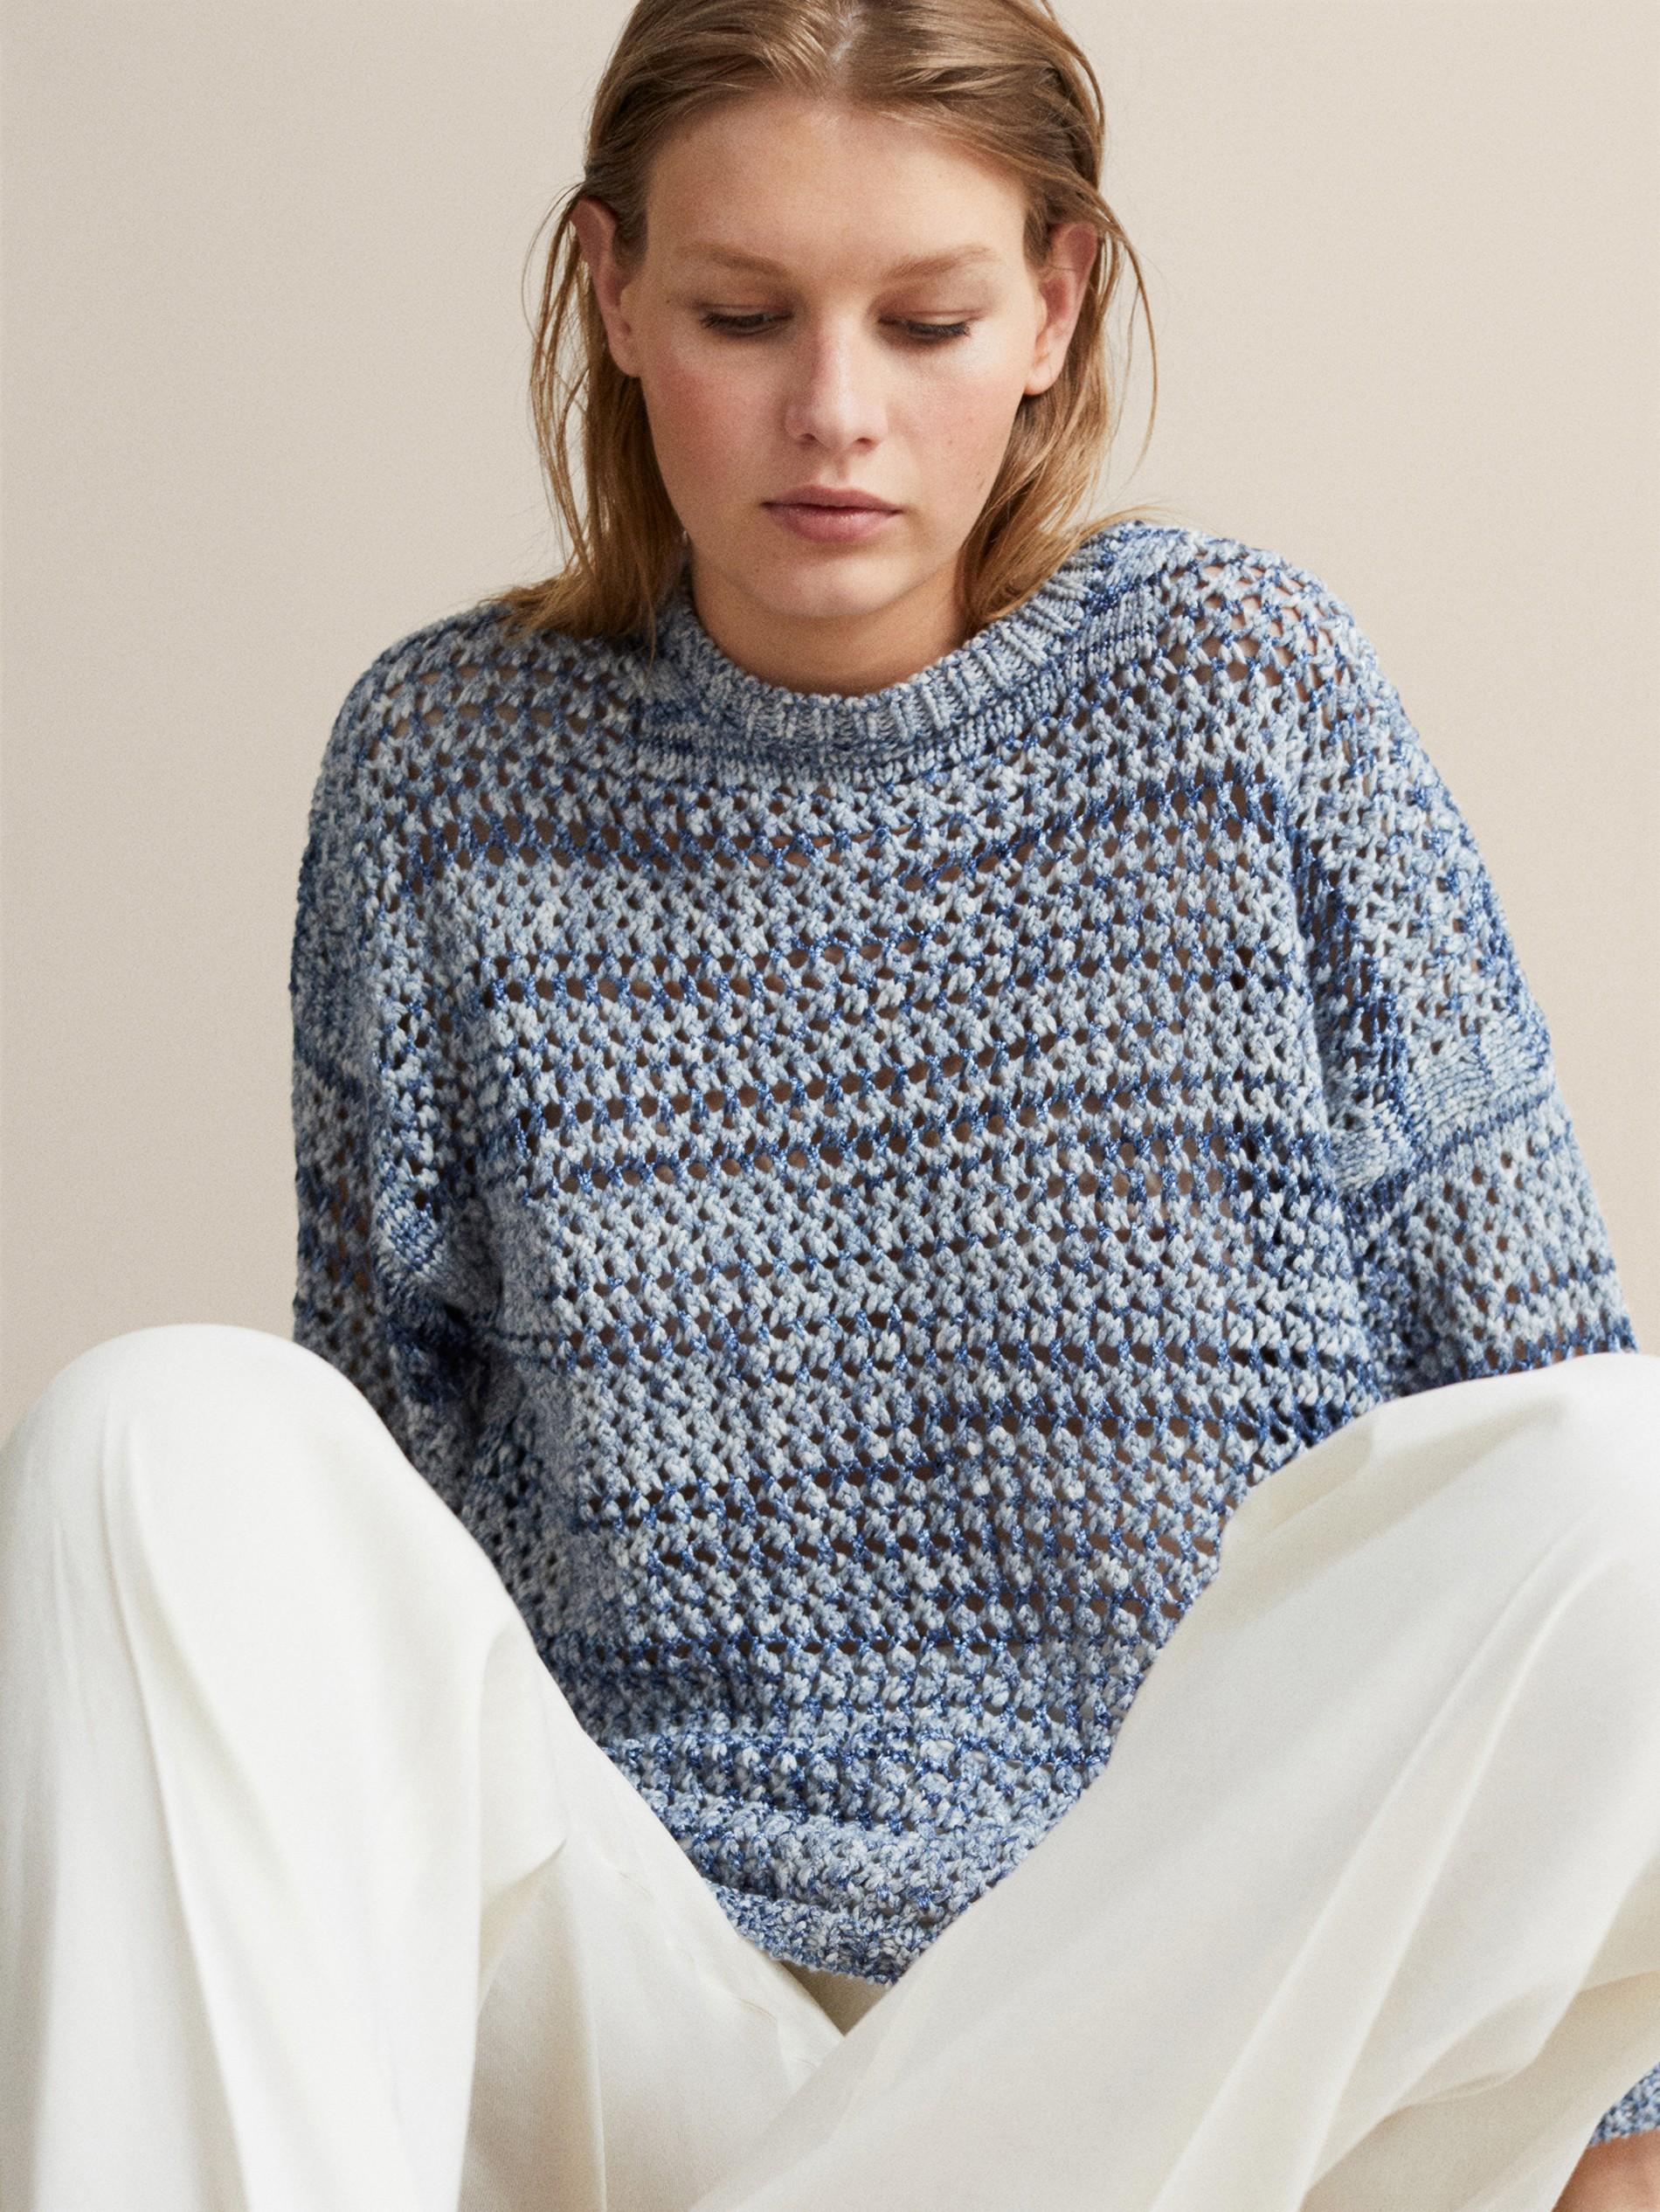 Sleeved Pieces Azul Knitted Long Women Pullover Blue Wool 92EDIH